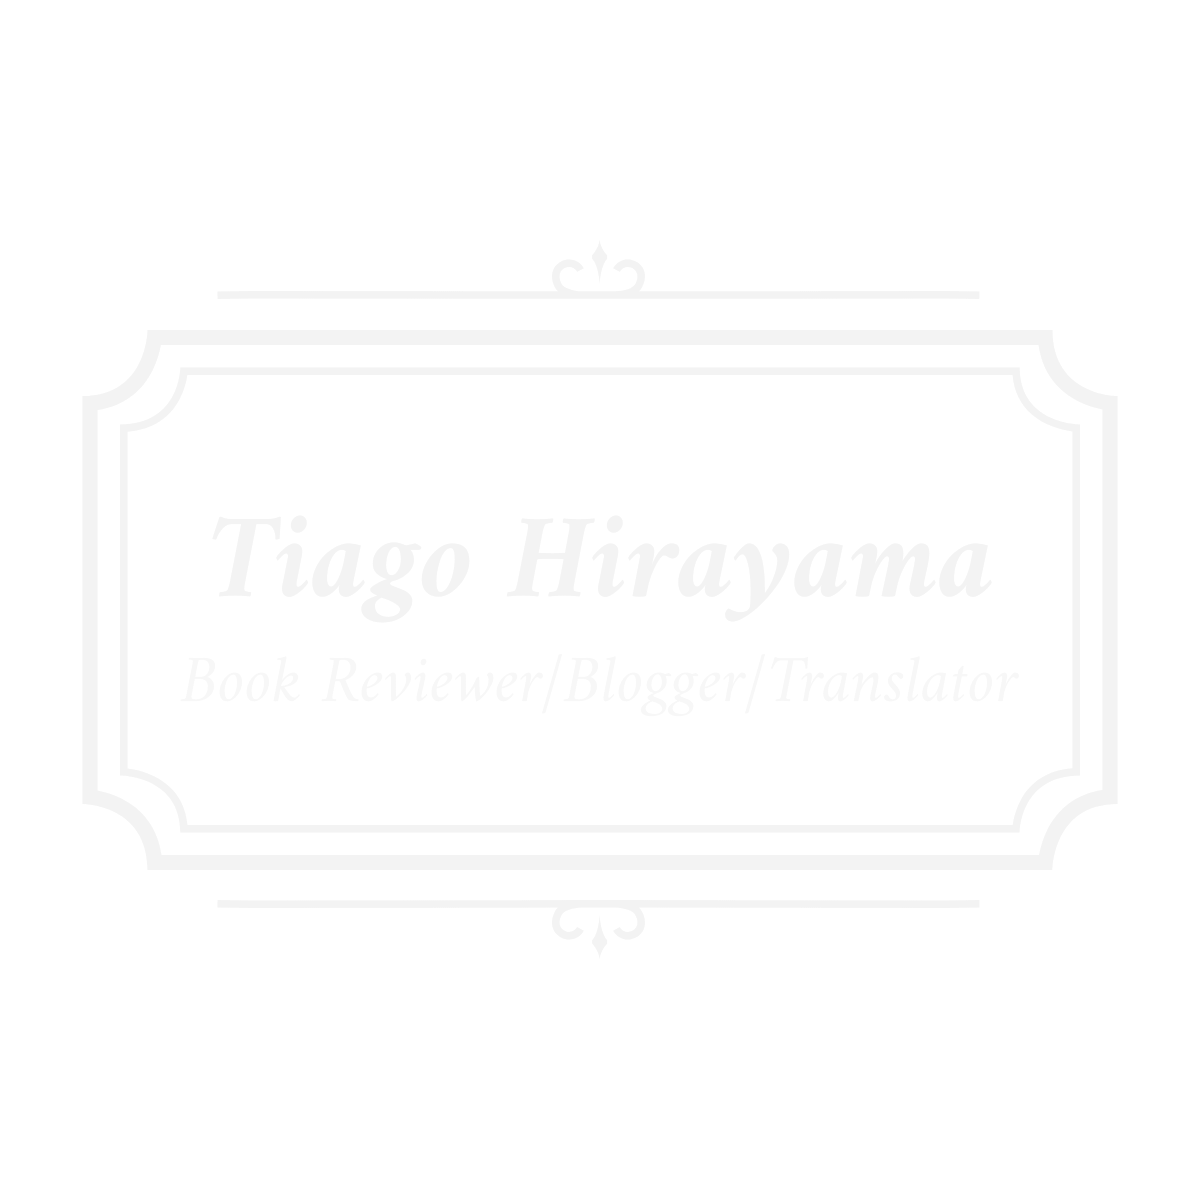 Tiago Hirayama